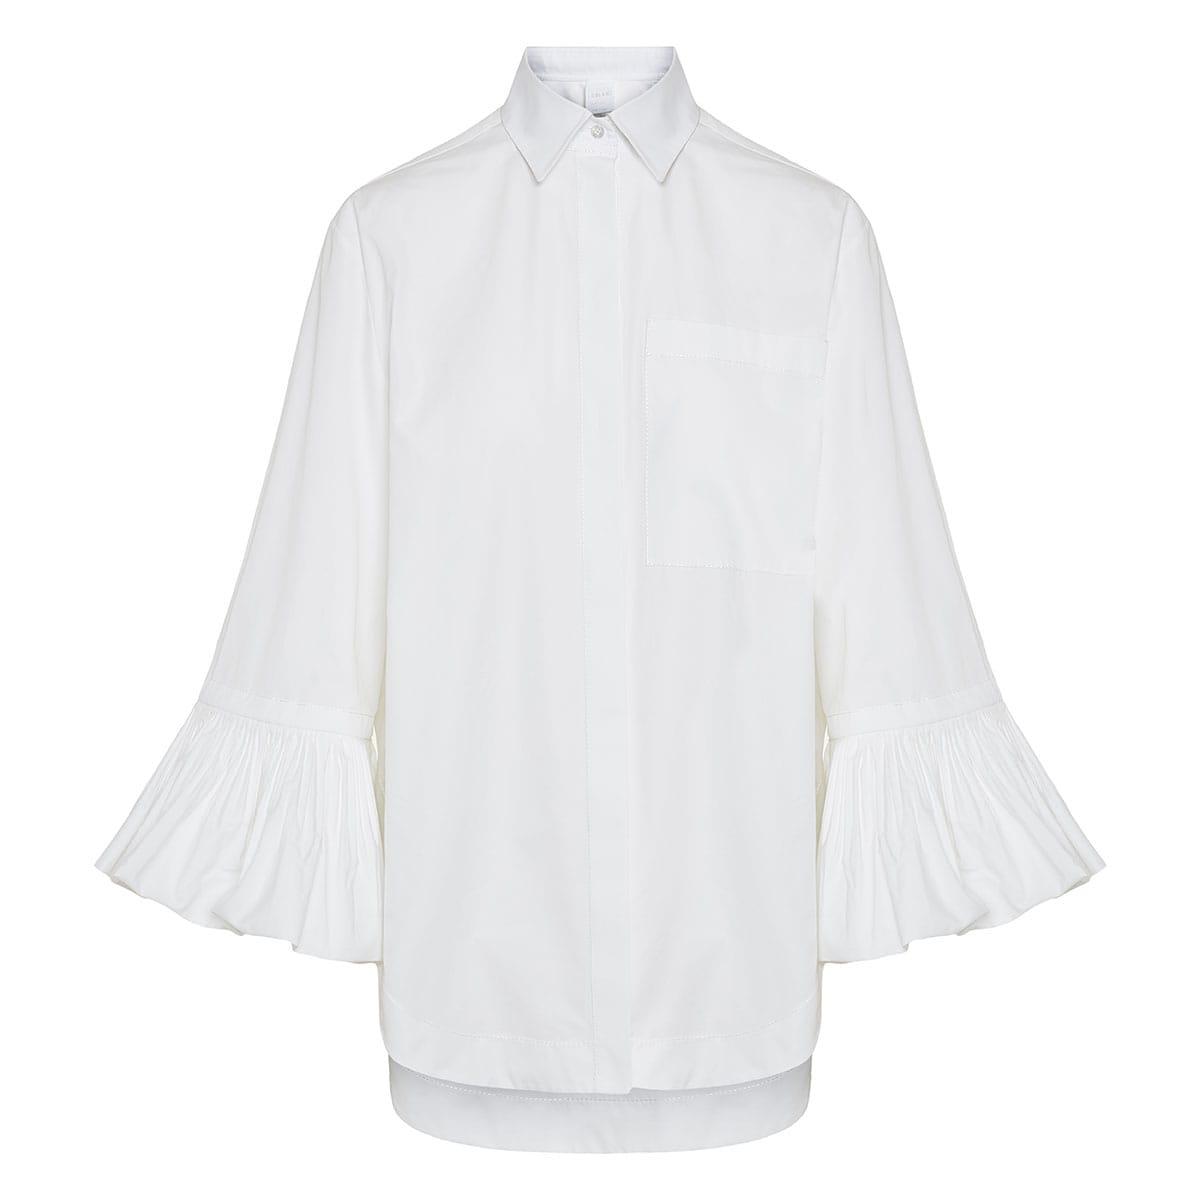 Oversized shirt with ruffled cuffs